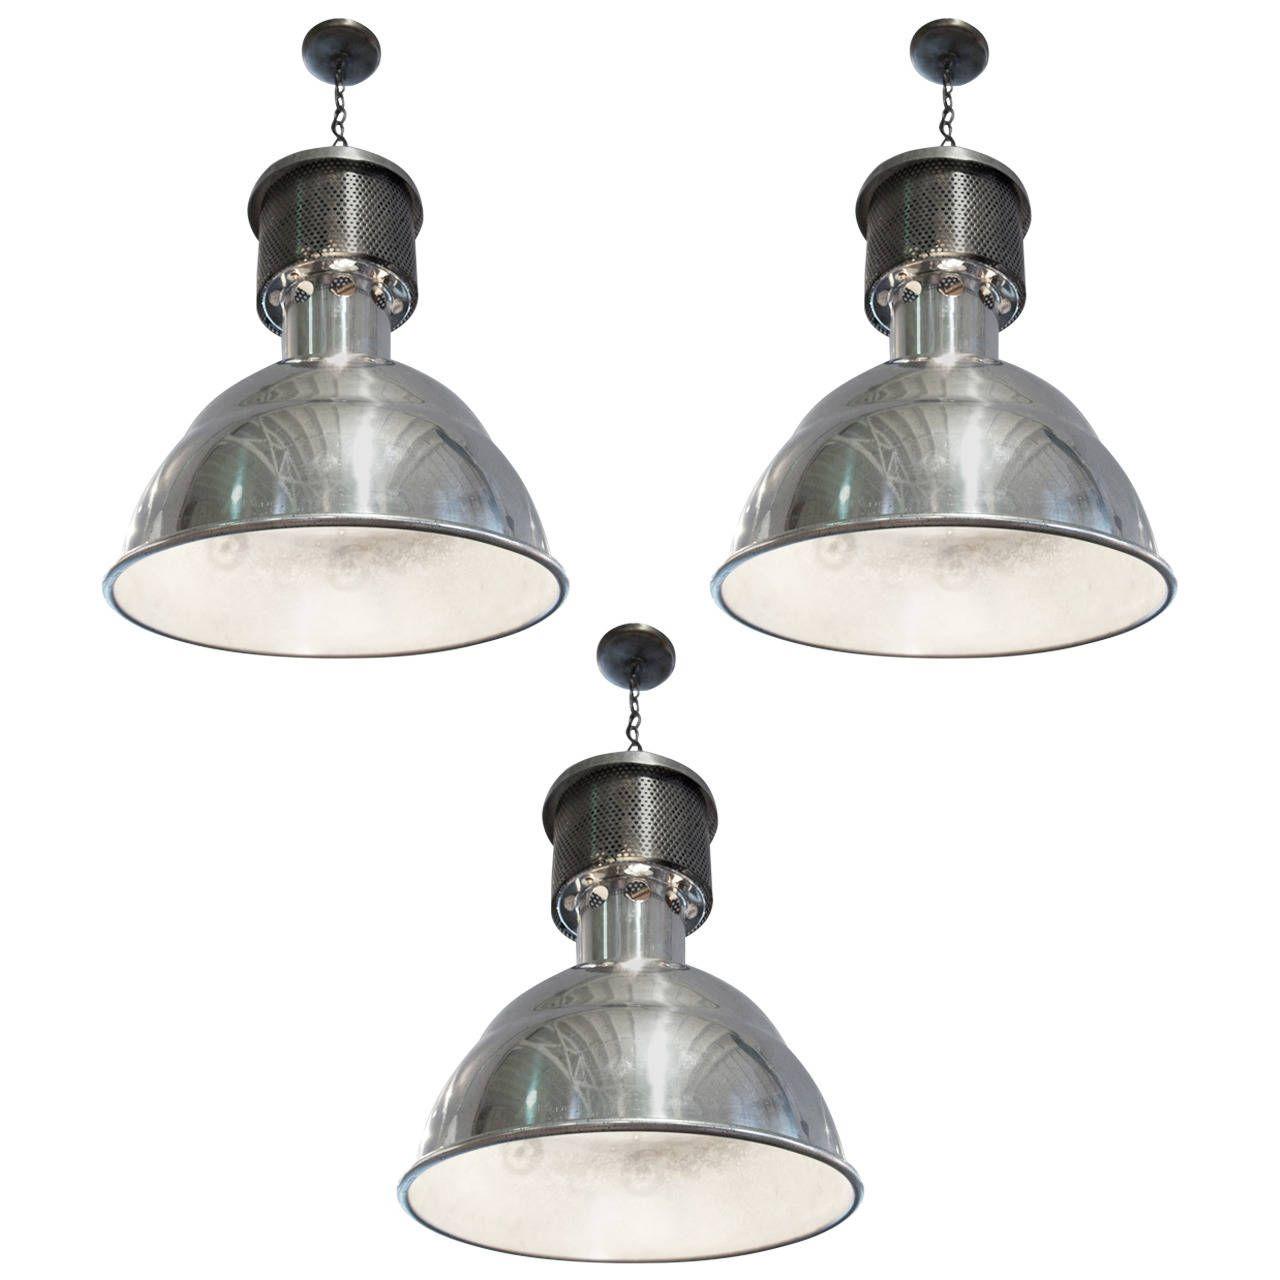 Set of three large industrial chrome metal light pendants